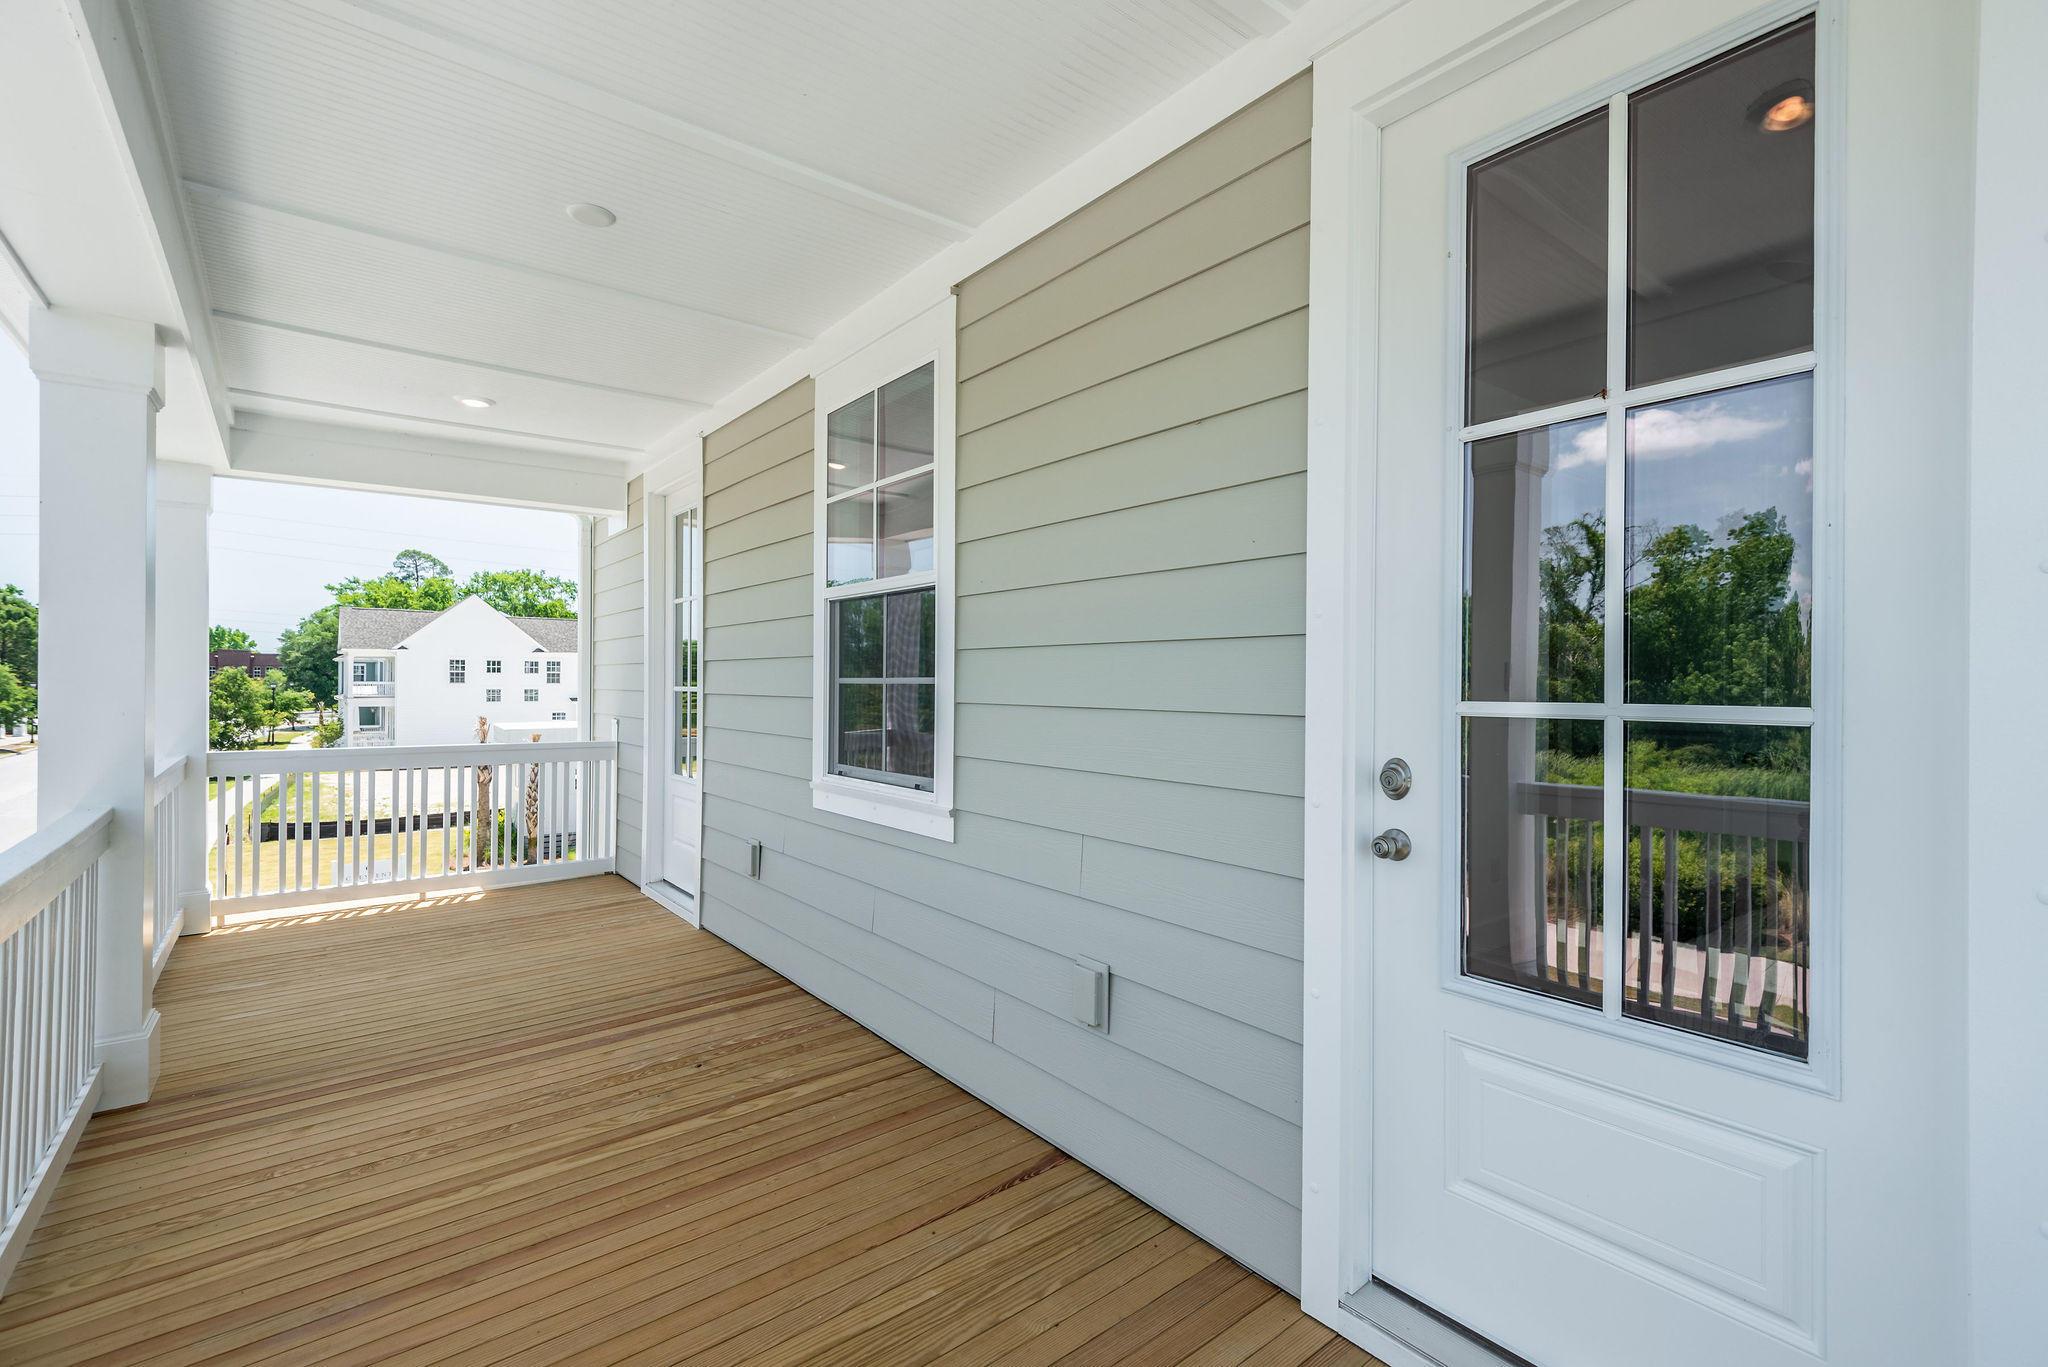 Midtown Homes For Sale - 1533 Kepley, Mount Pleasant, SC - 12